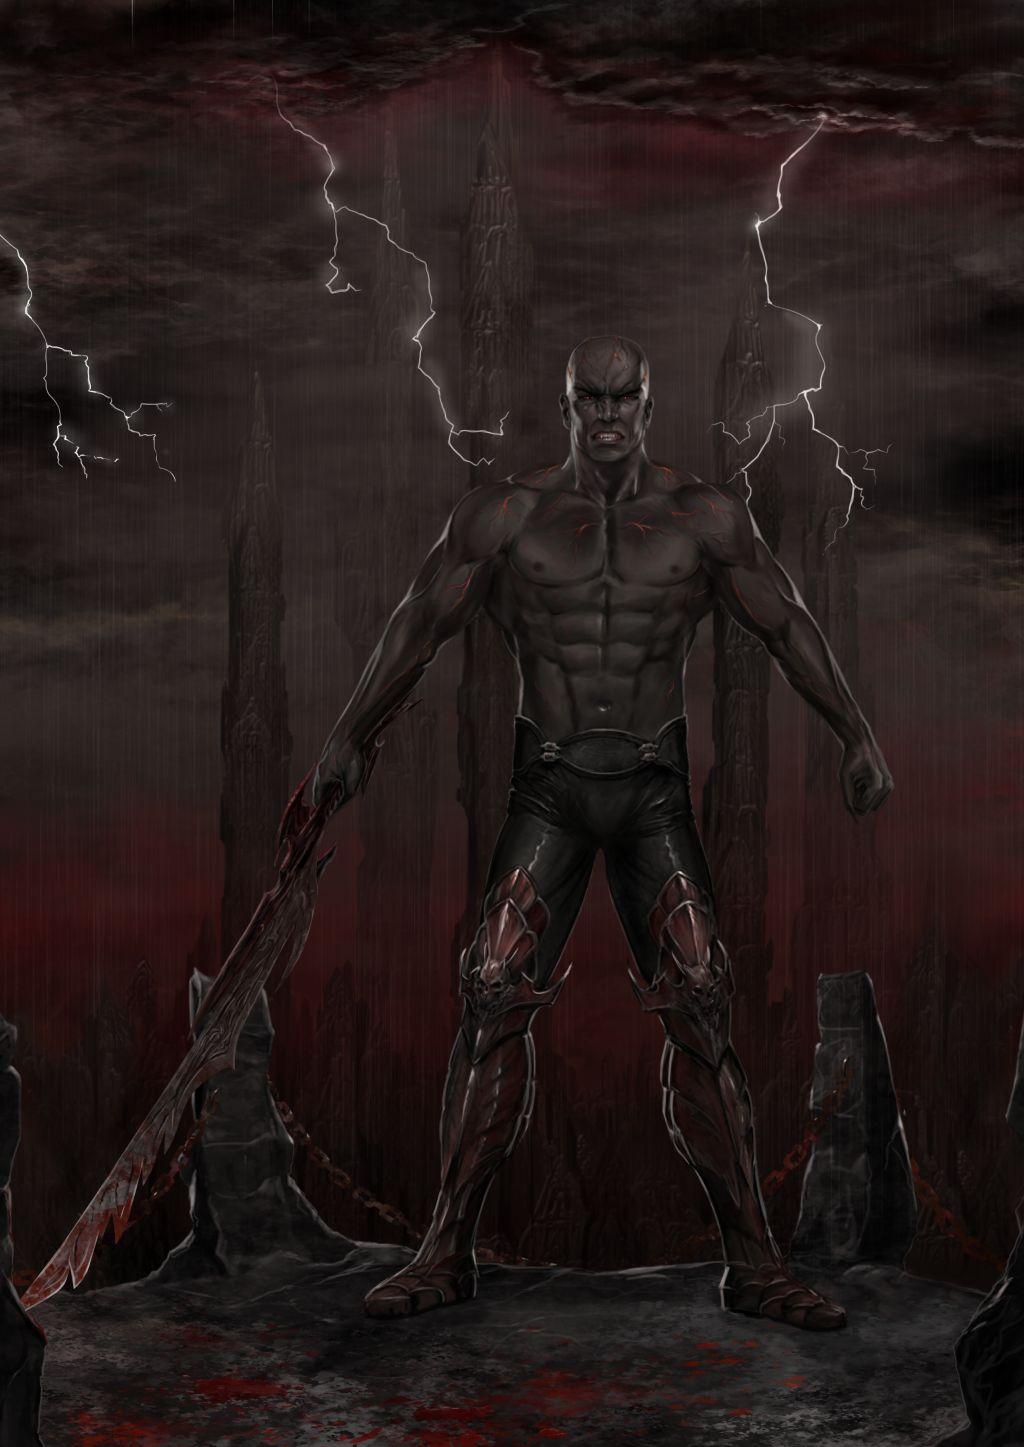 Sartan, the Malevolent